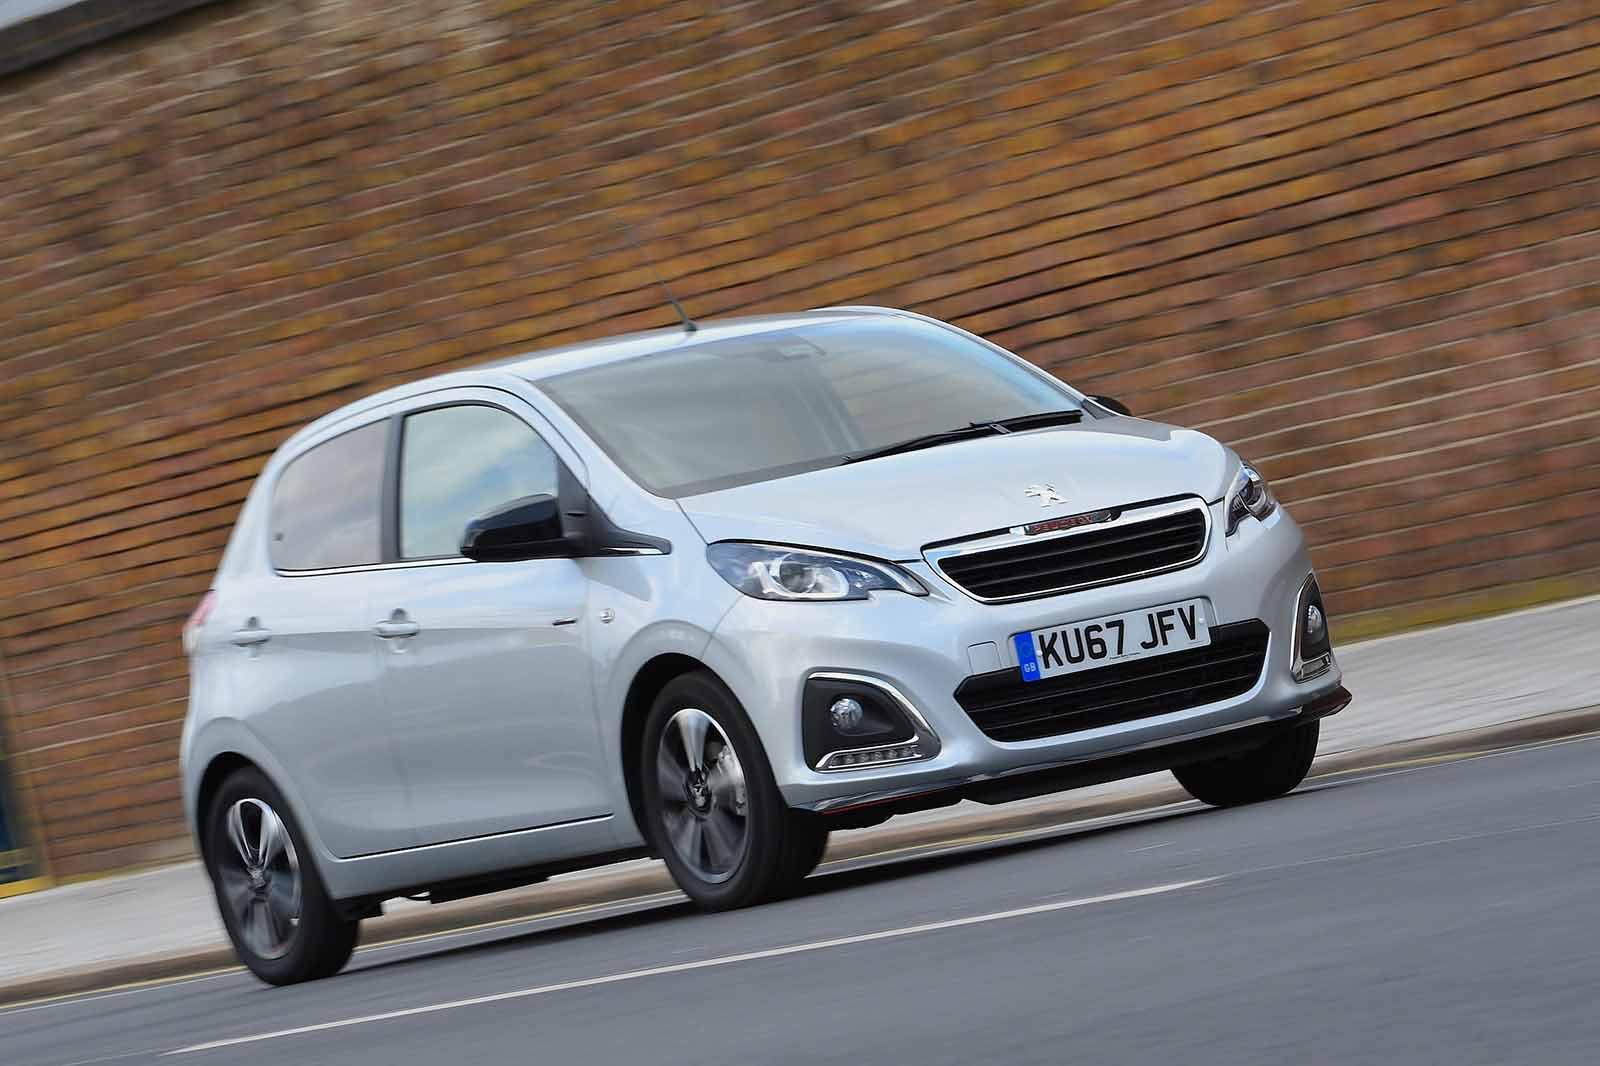 Peugeot 108 2018 RHD front tracking shot